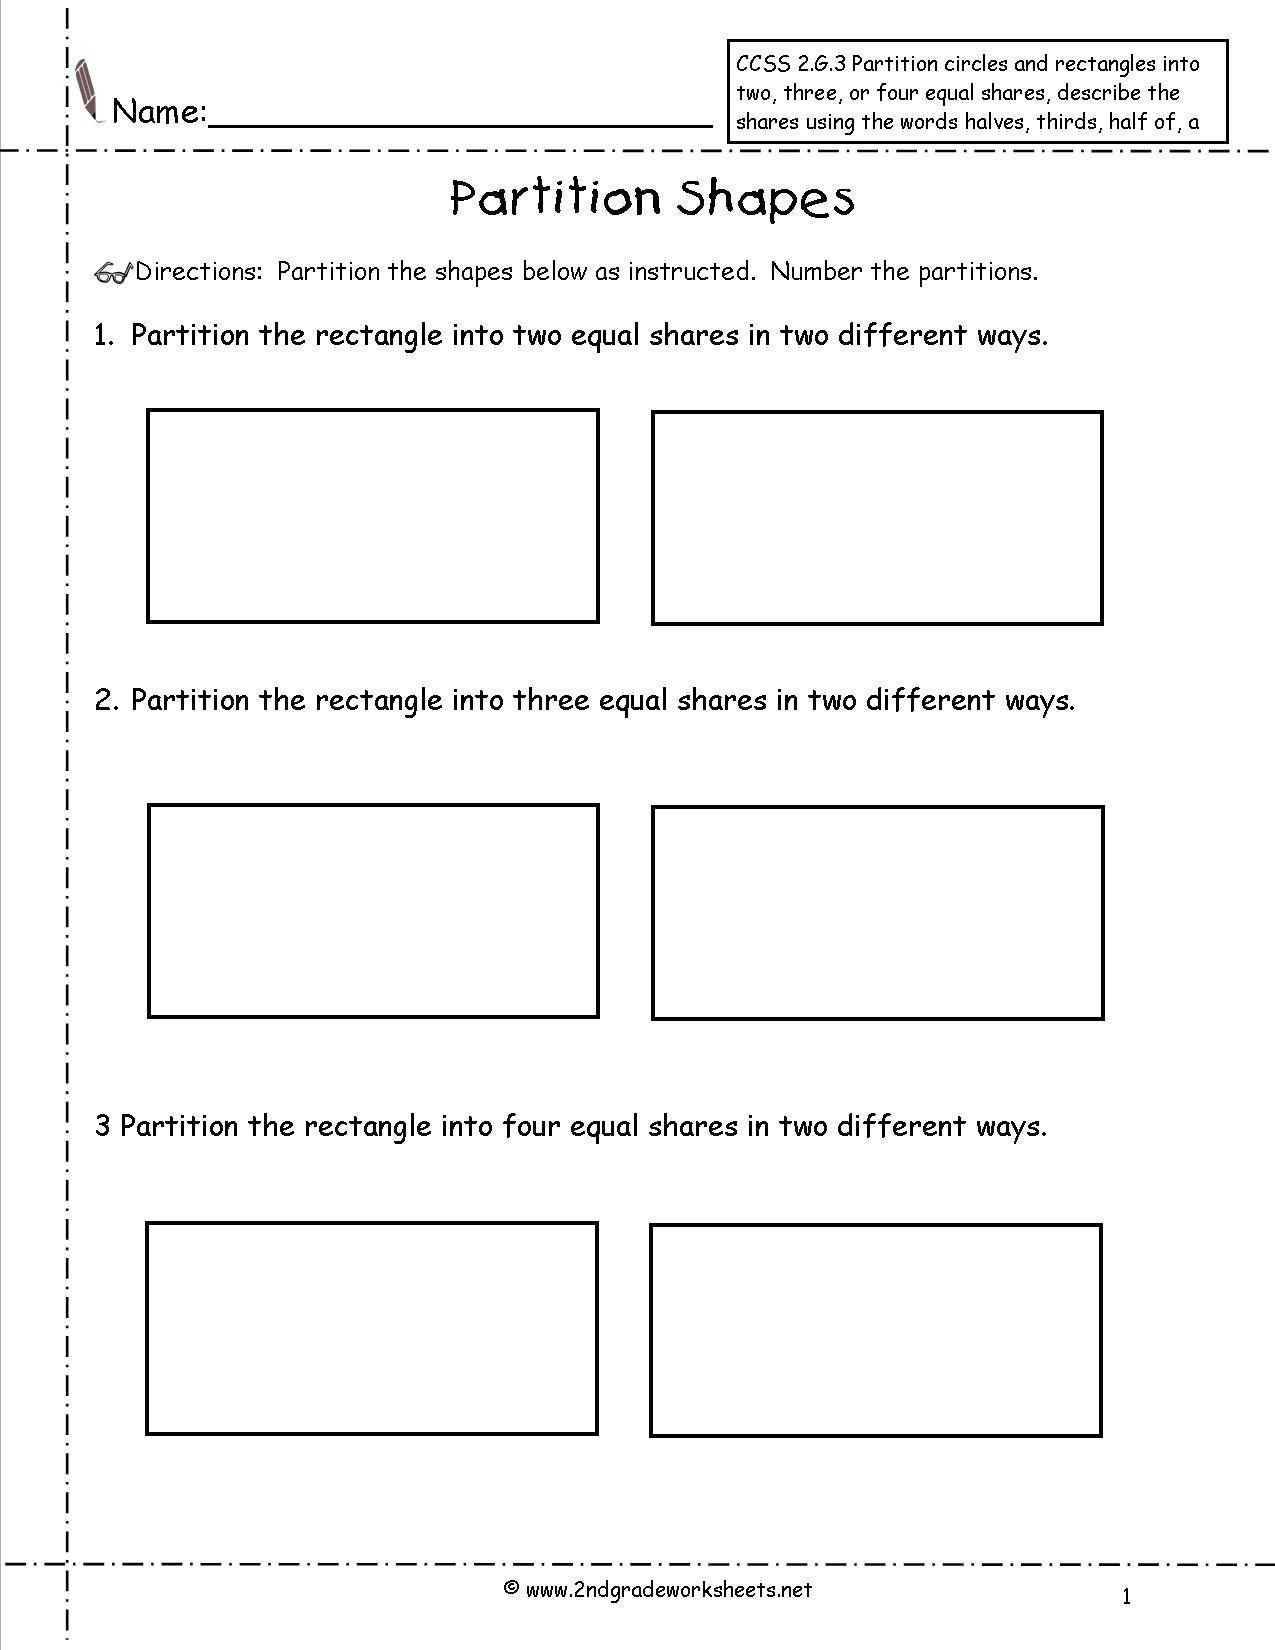 2nd Grade Geometry Worksheets Ccss 2g3 Worksheet In 2020 Geometry Worksheets 2nd Grade Worksheets 2nd Grade Math